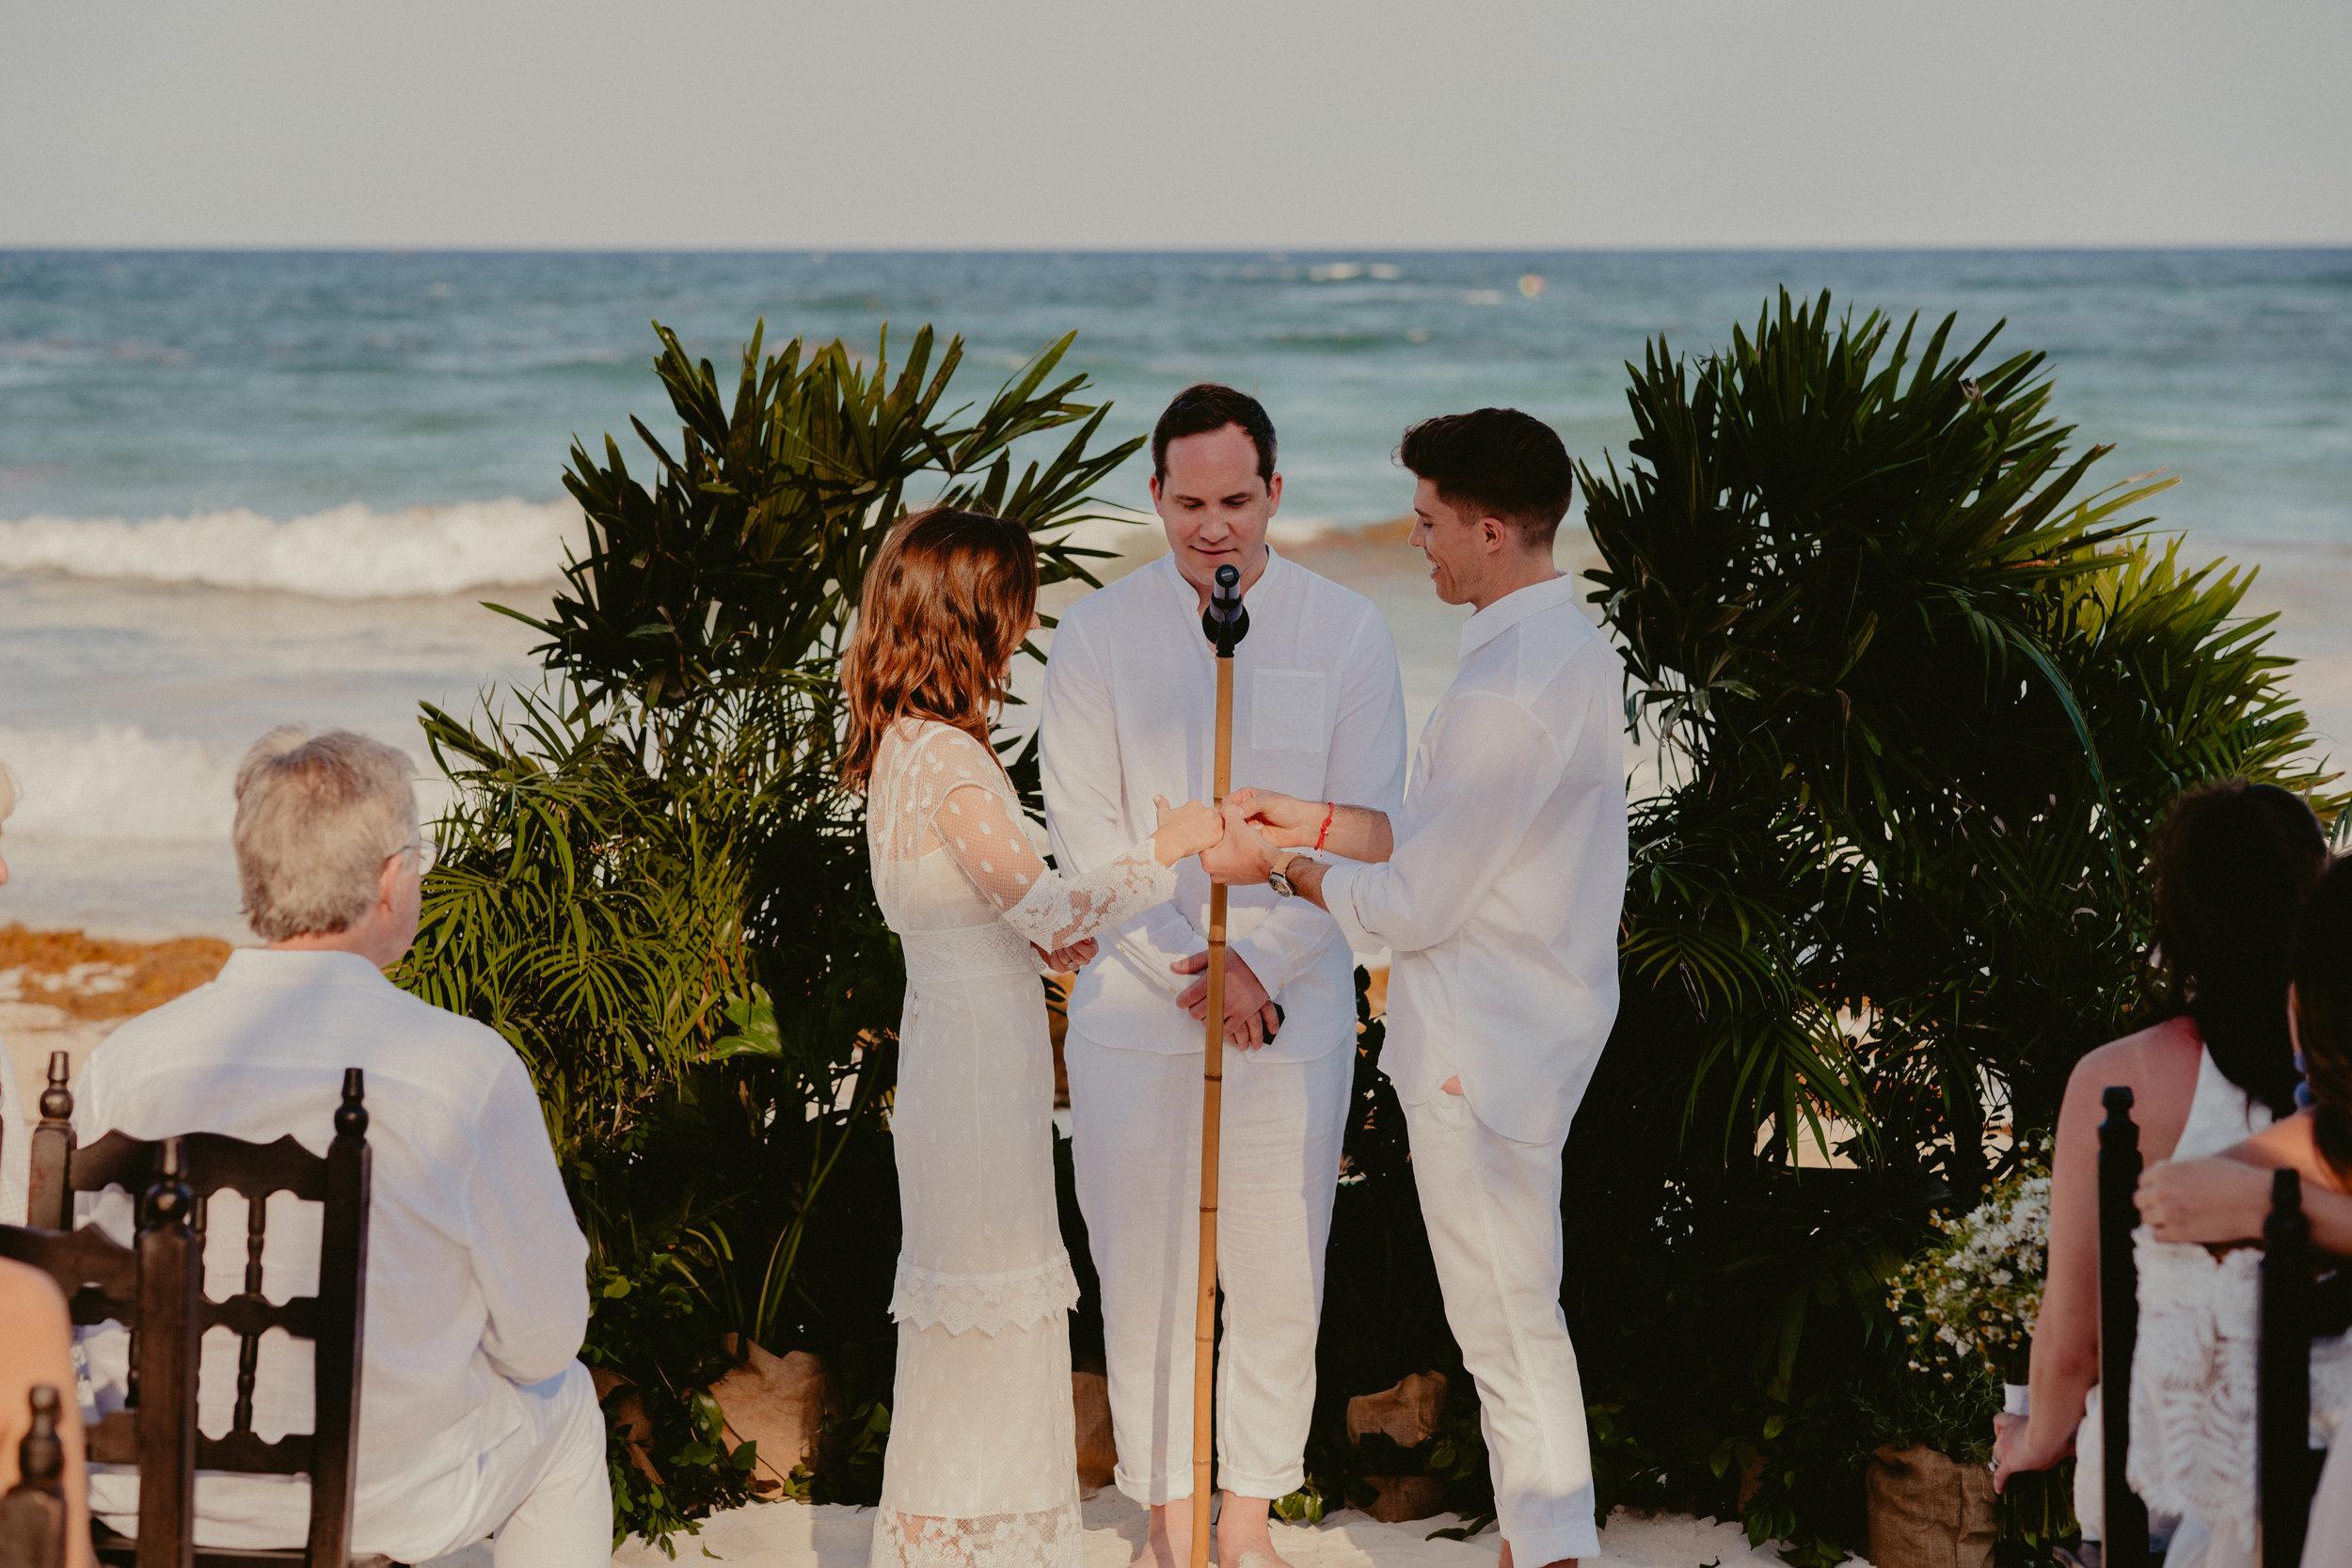 Joanna-and-Cameron_Ahua_Tulum_Wedding_Chellise_MIchael-Photography-308.jpg